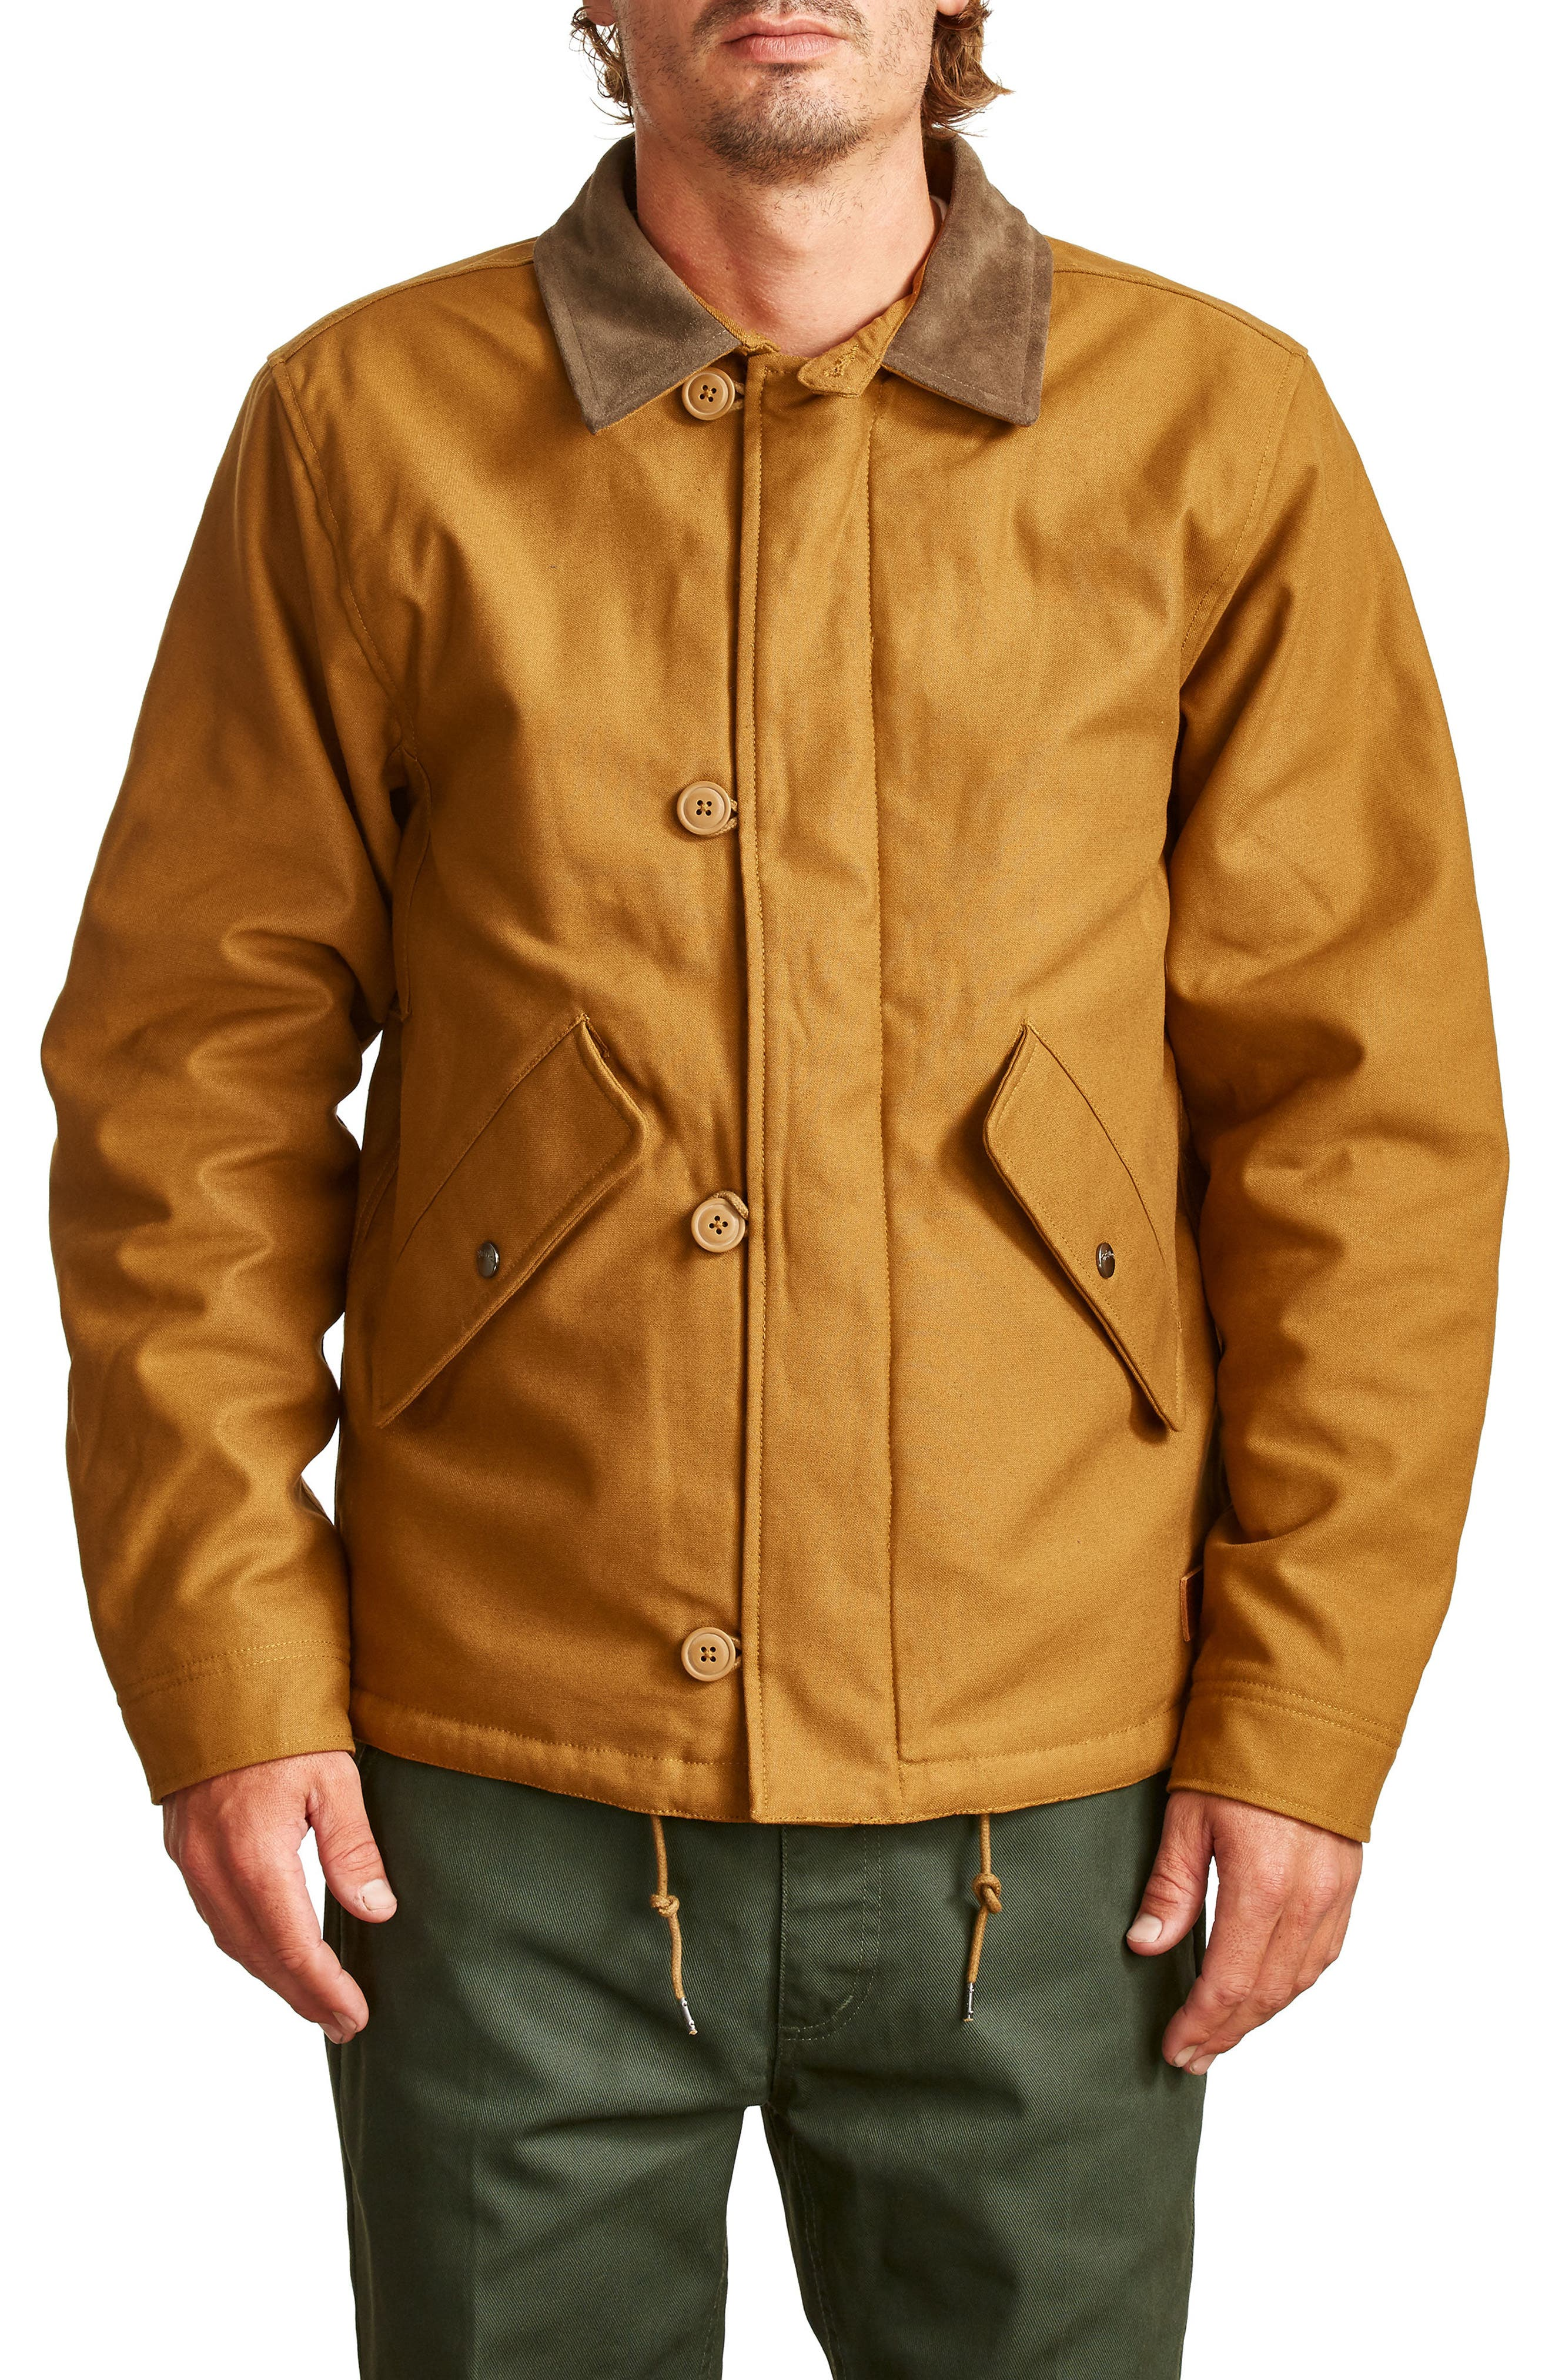 Brixton Apex Water Resistant Jacket